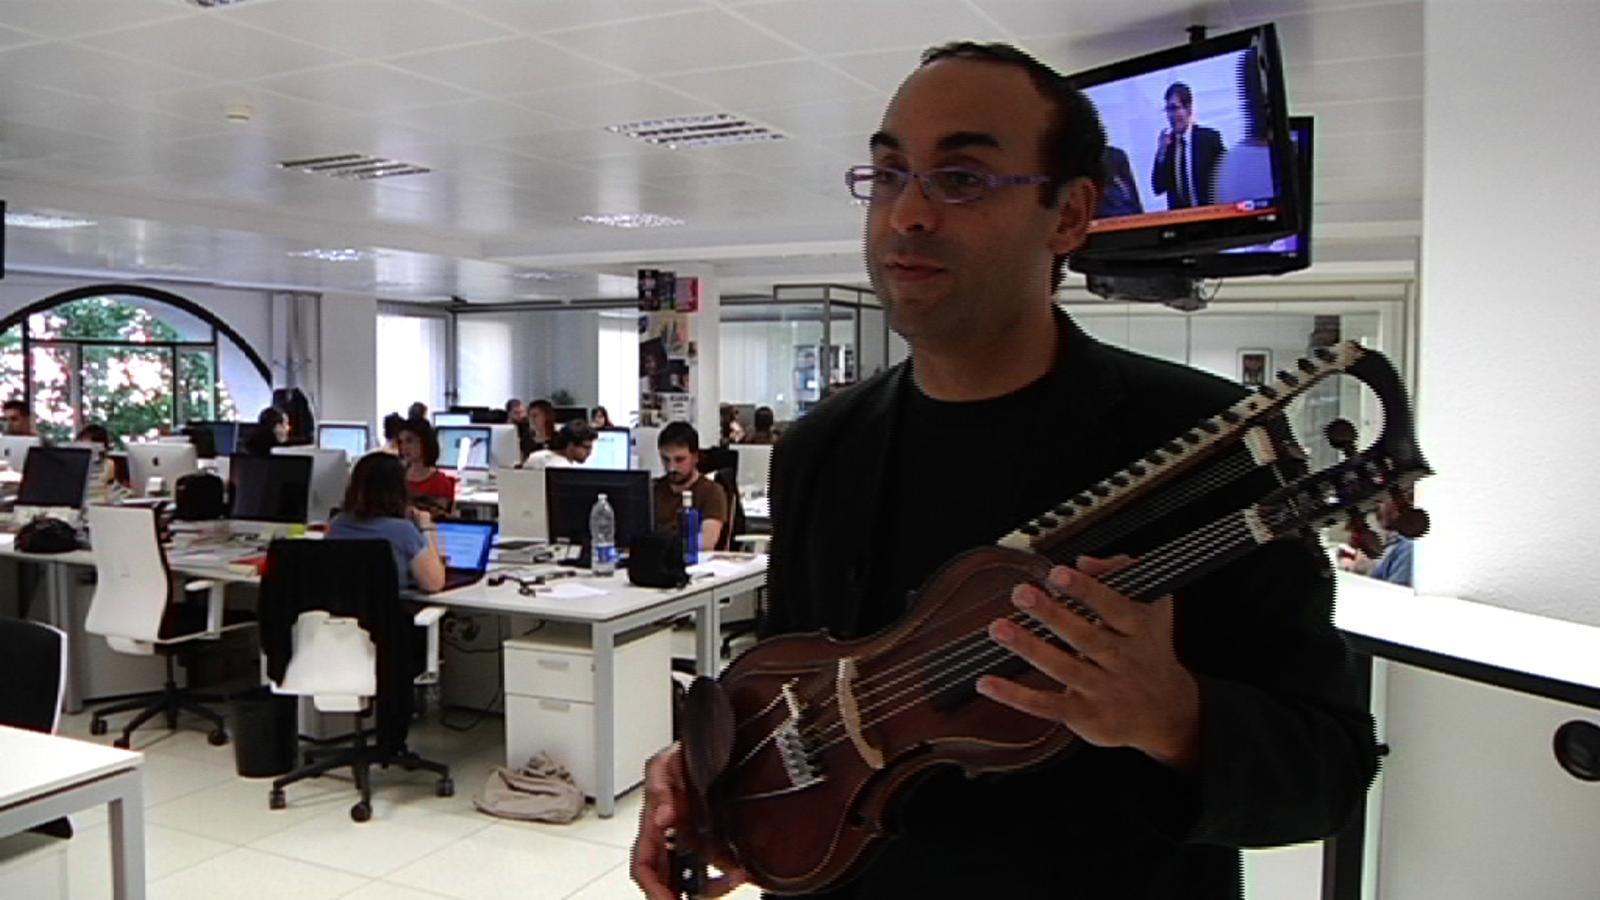 Perseguint el violí de 21 cordes